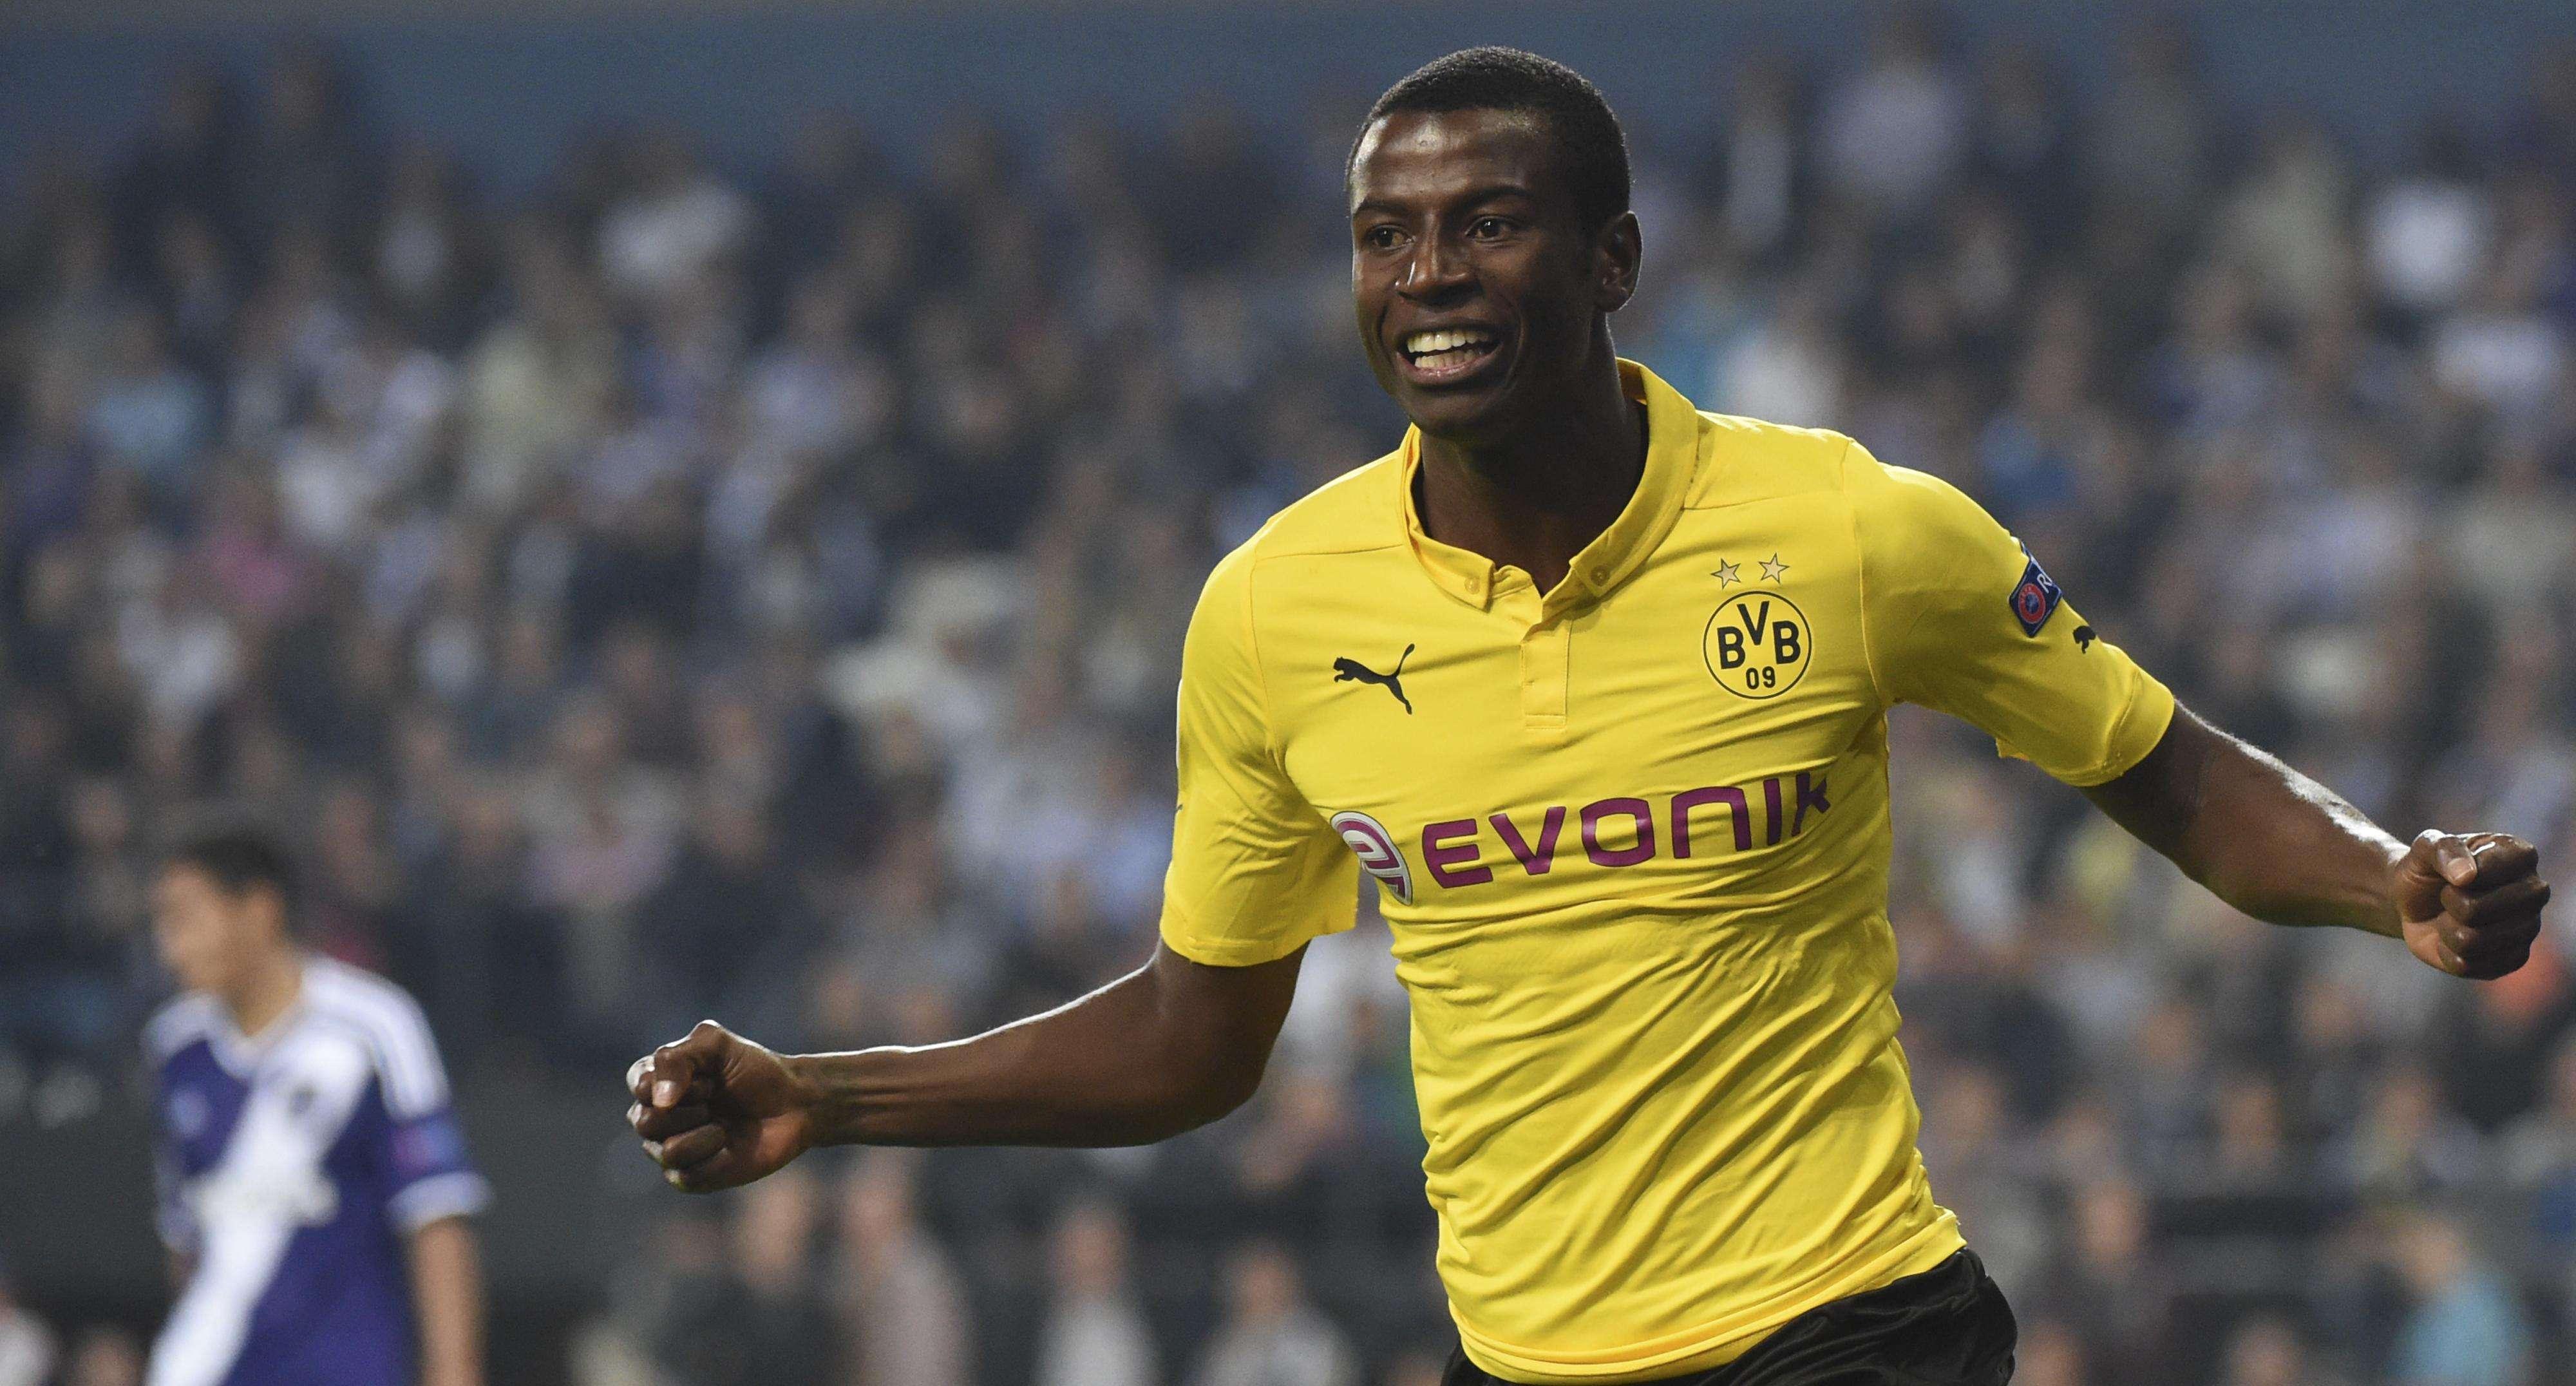 Adrian Ramos marcou duas vezes na vitória do Borussia Dortmund sobre o Anderlecht Foto: Geert Vanden Winjgaert/AP